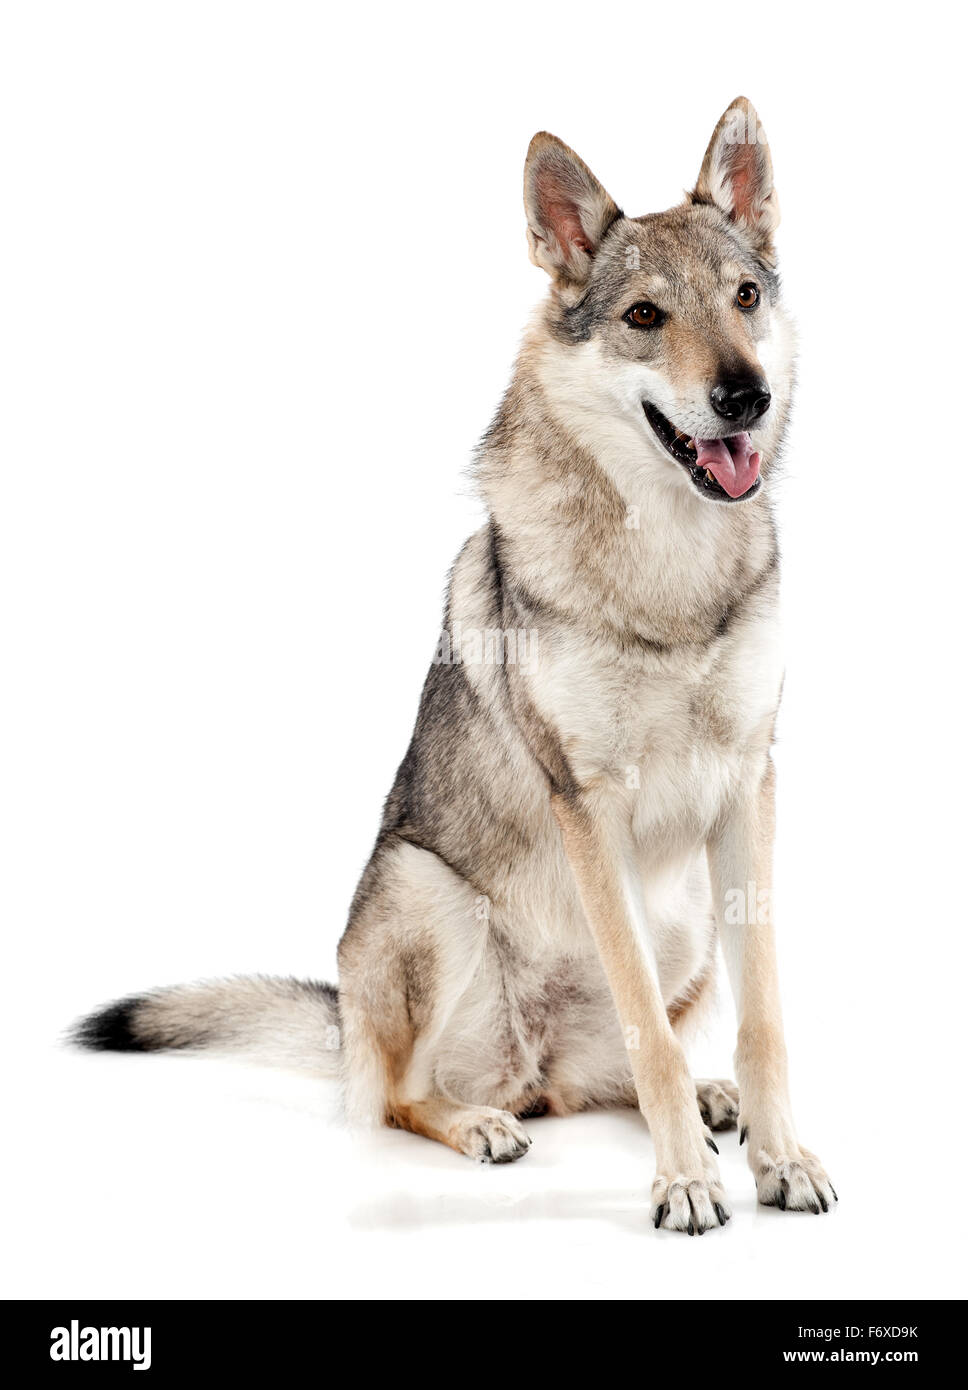 Czechoslovakian wolf dog or wolf-dog, a hybrid between a German Shepherd dog and Carpathian wolf - Stock Image